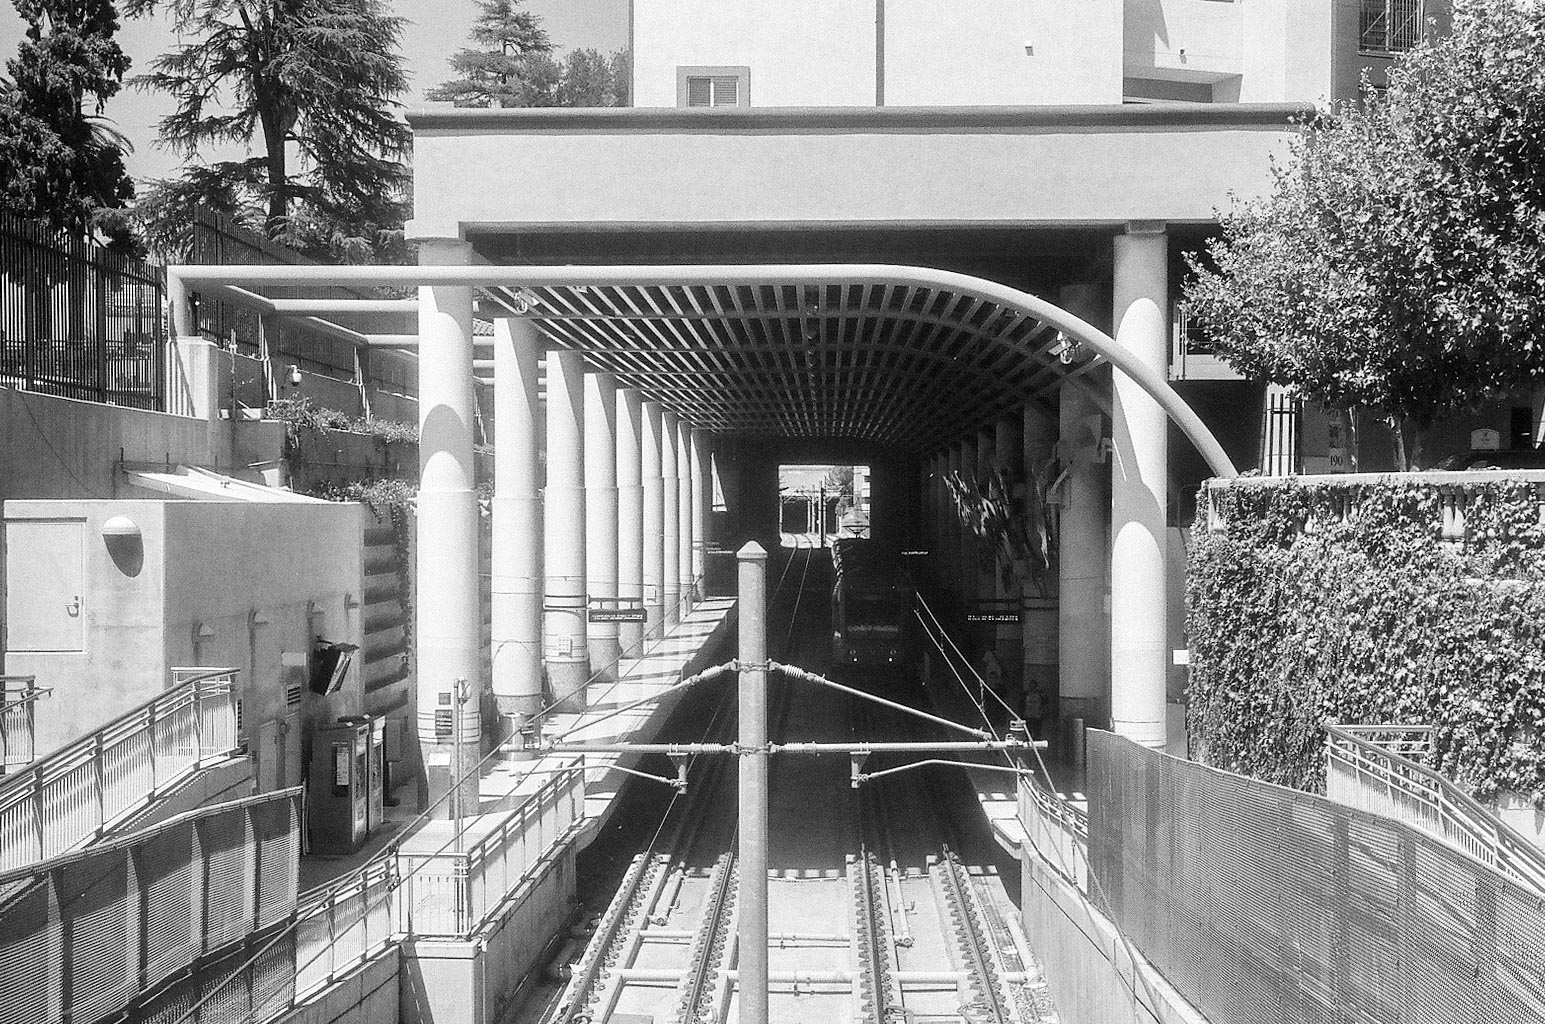 Entering Pasadena